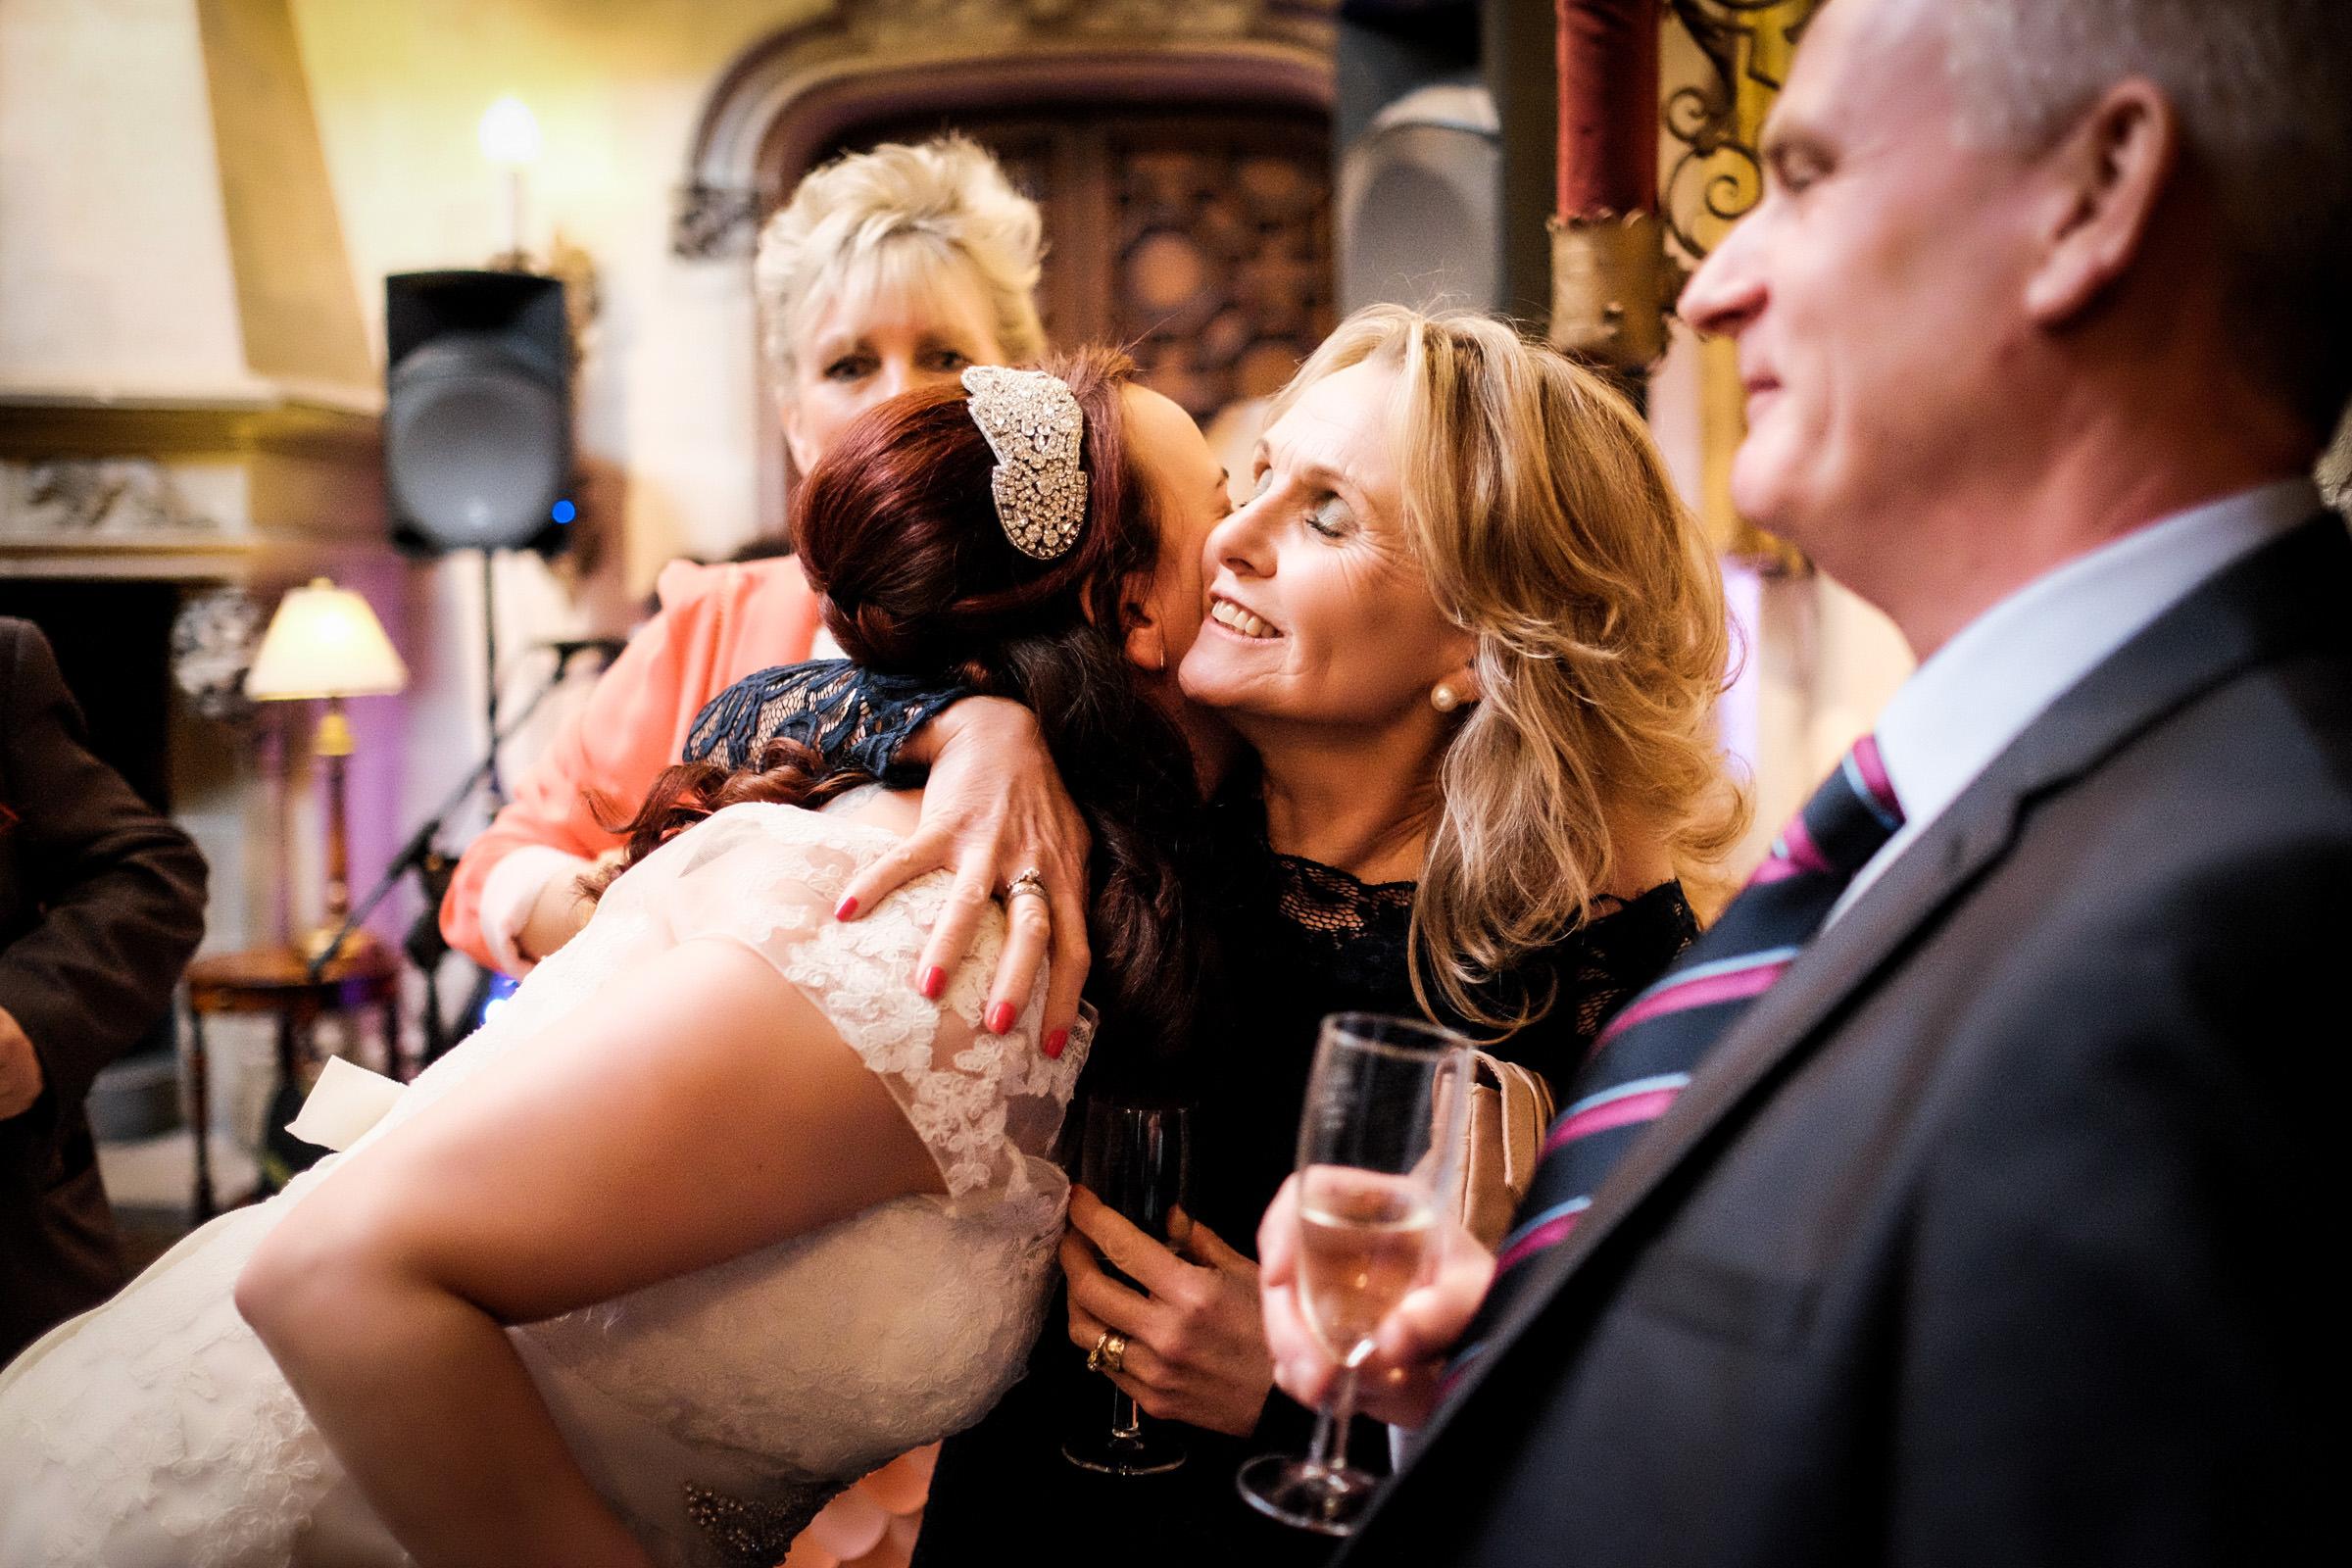 Wedding+at+Northcote+House+&+Sunningdale+Park+Wedding+in+Berkshire+022.jpg